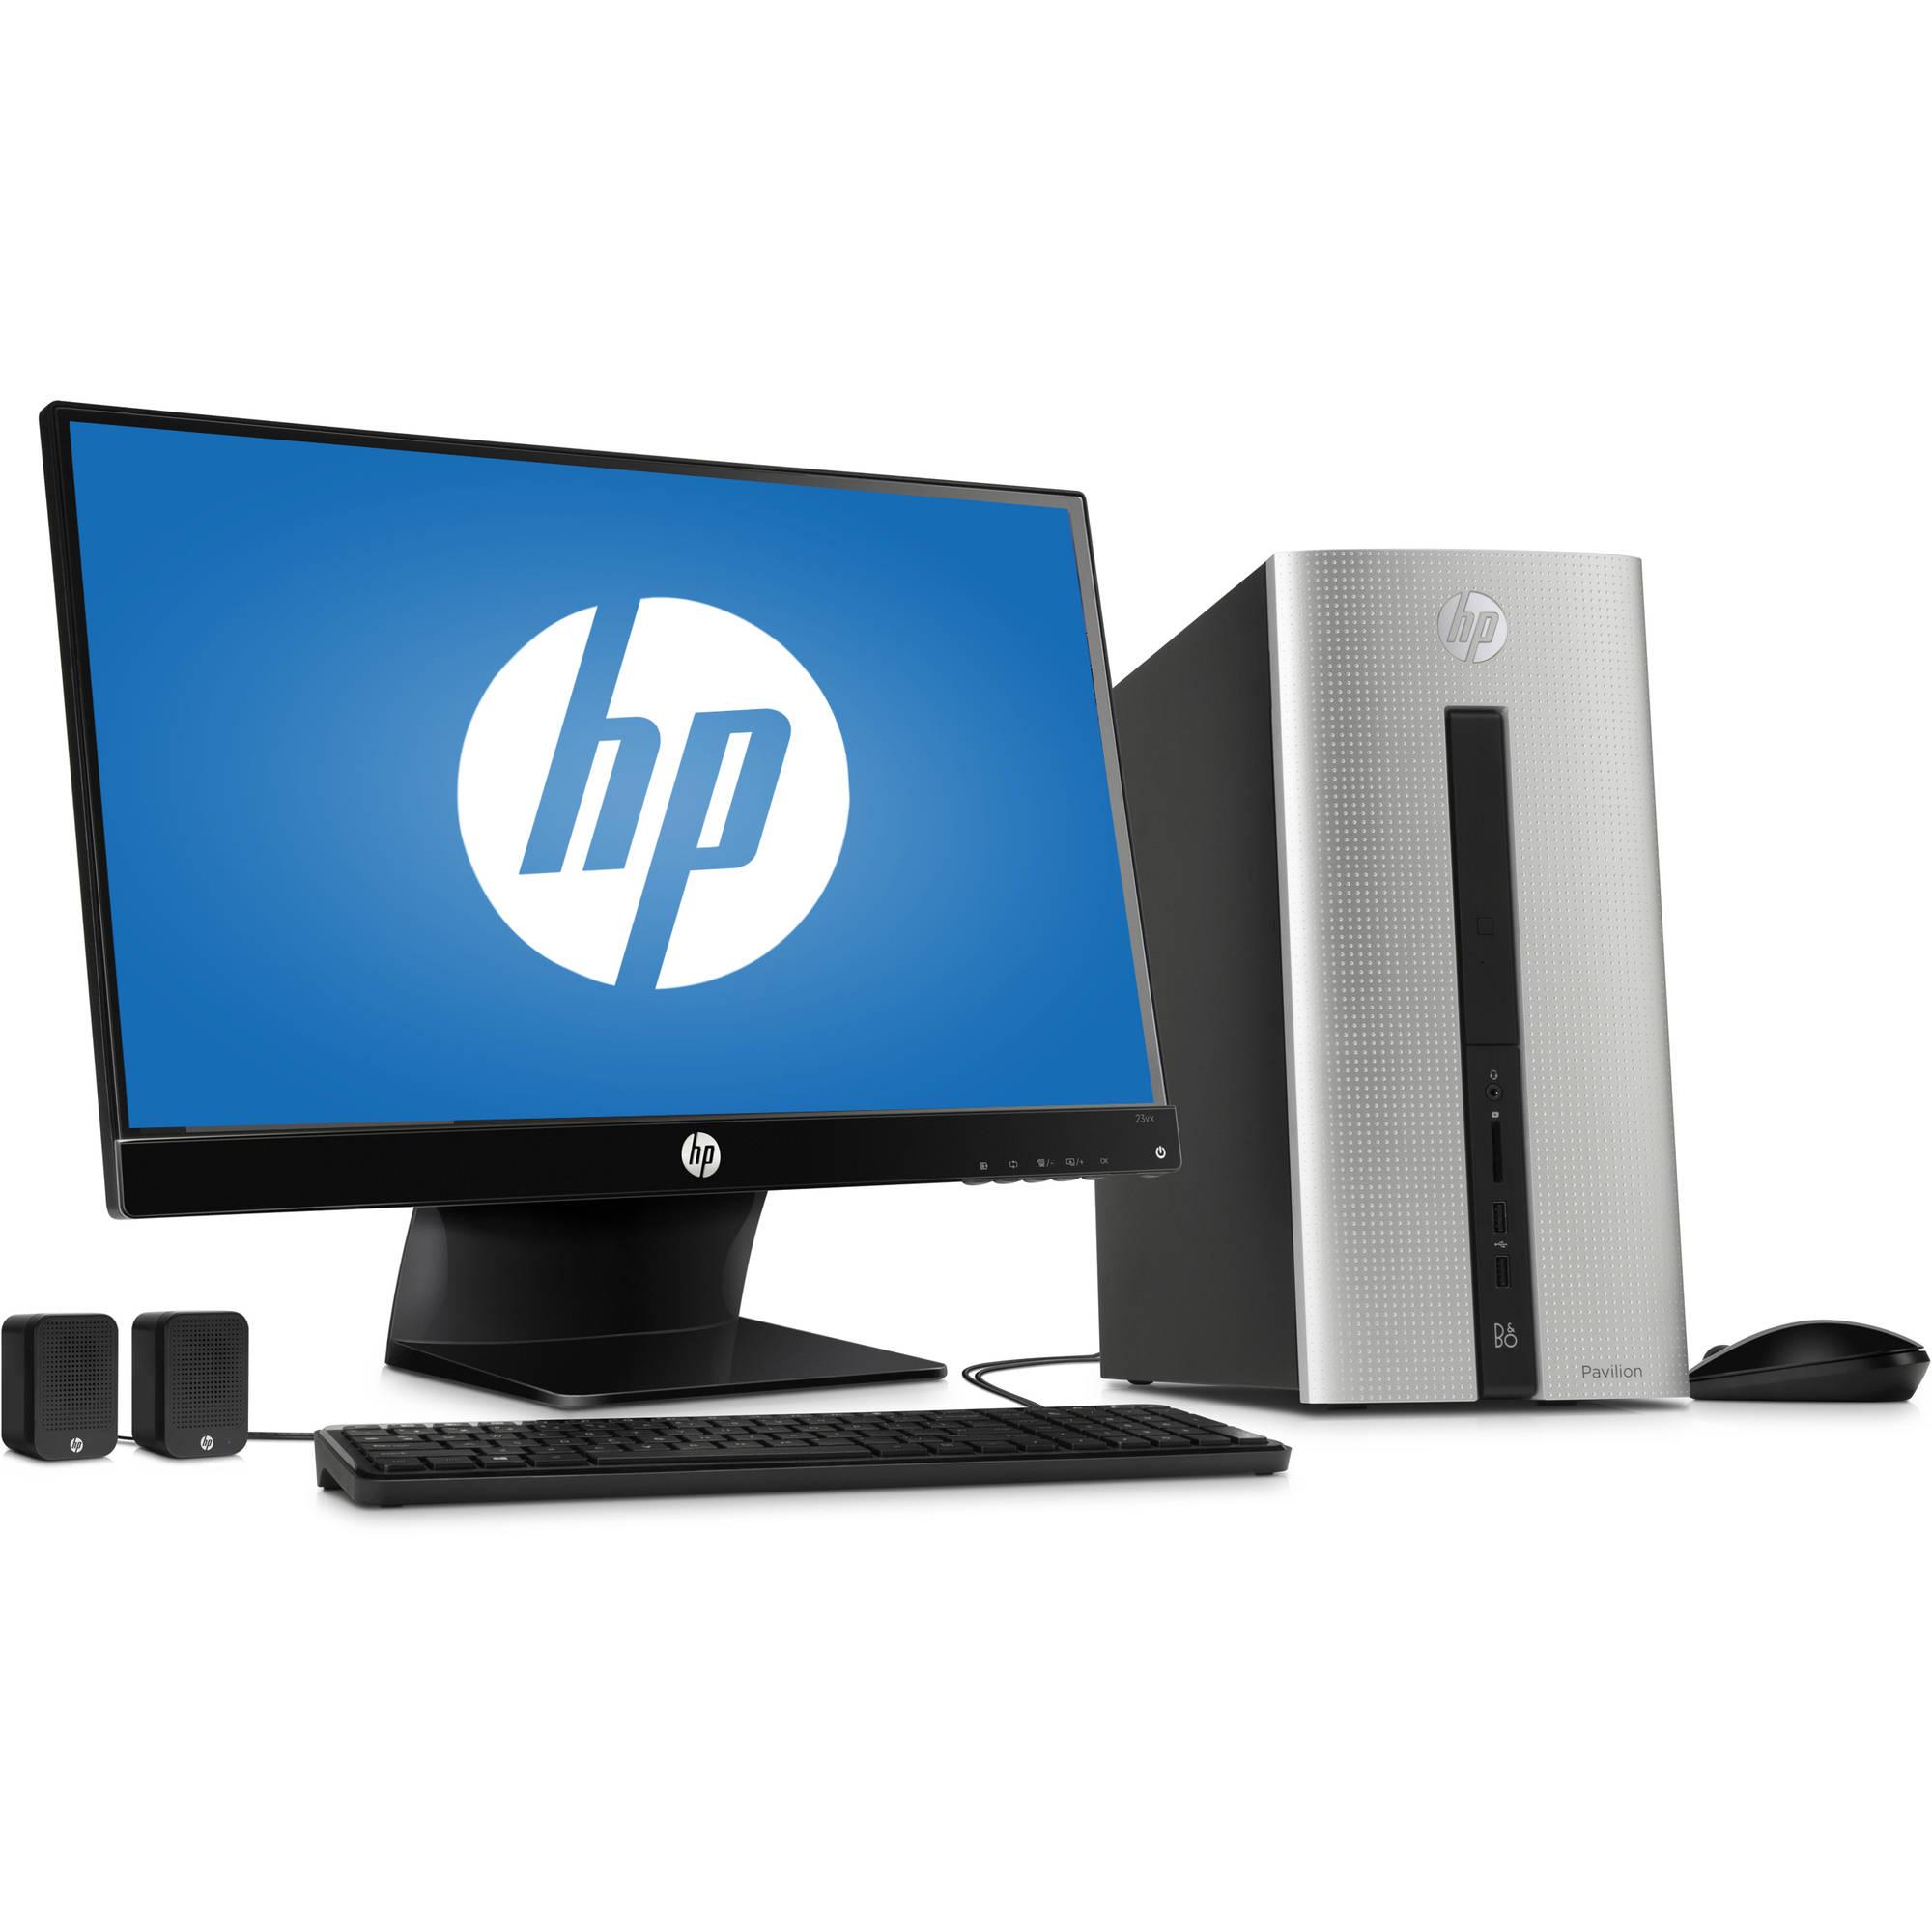 HP Pavilion 550-153wb Desktop PC with Intel Core i3-4170 ...